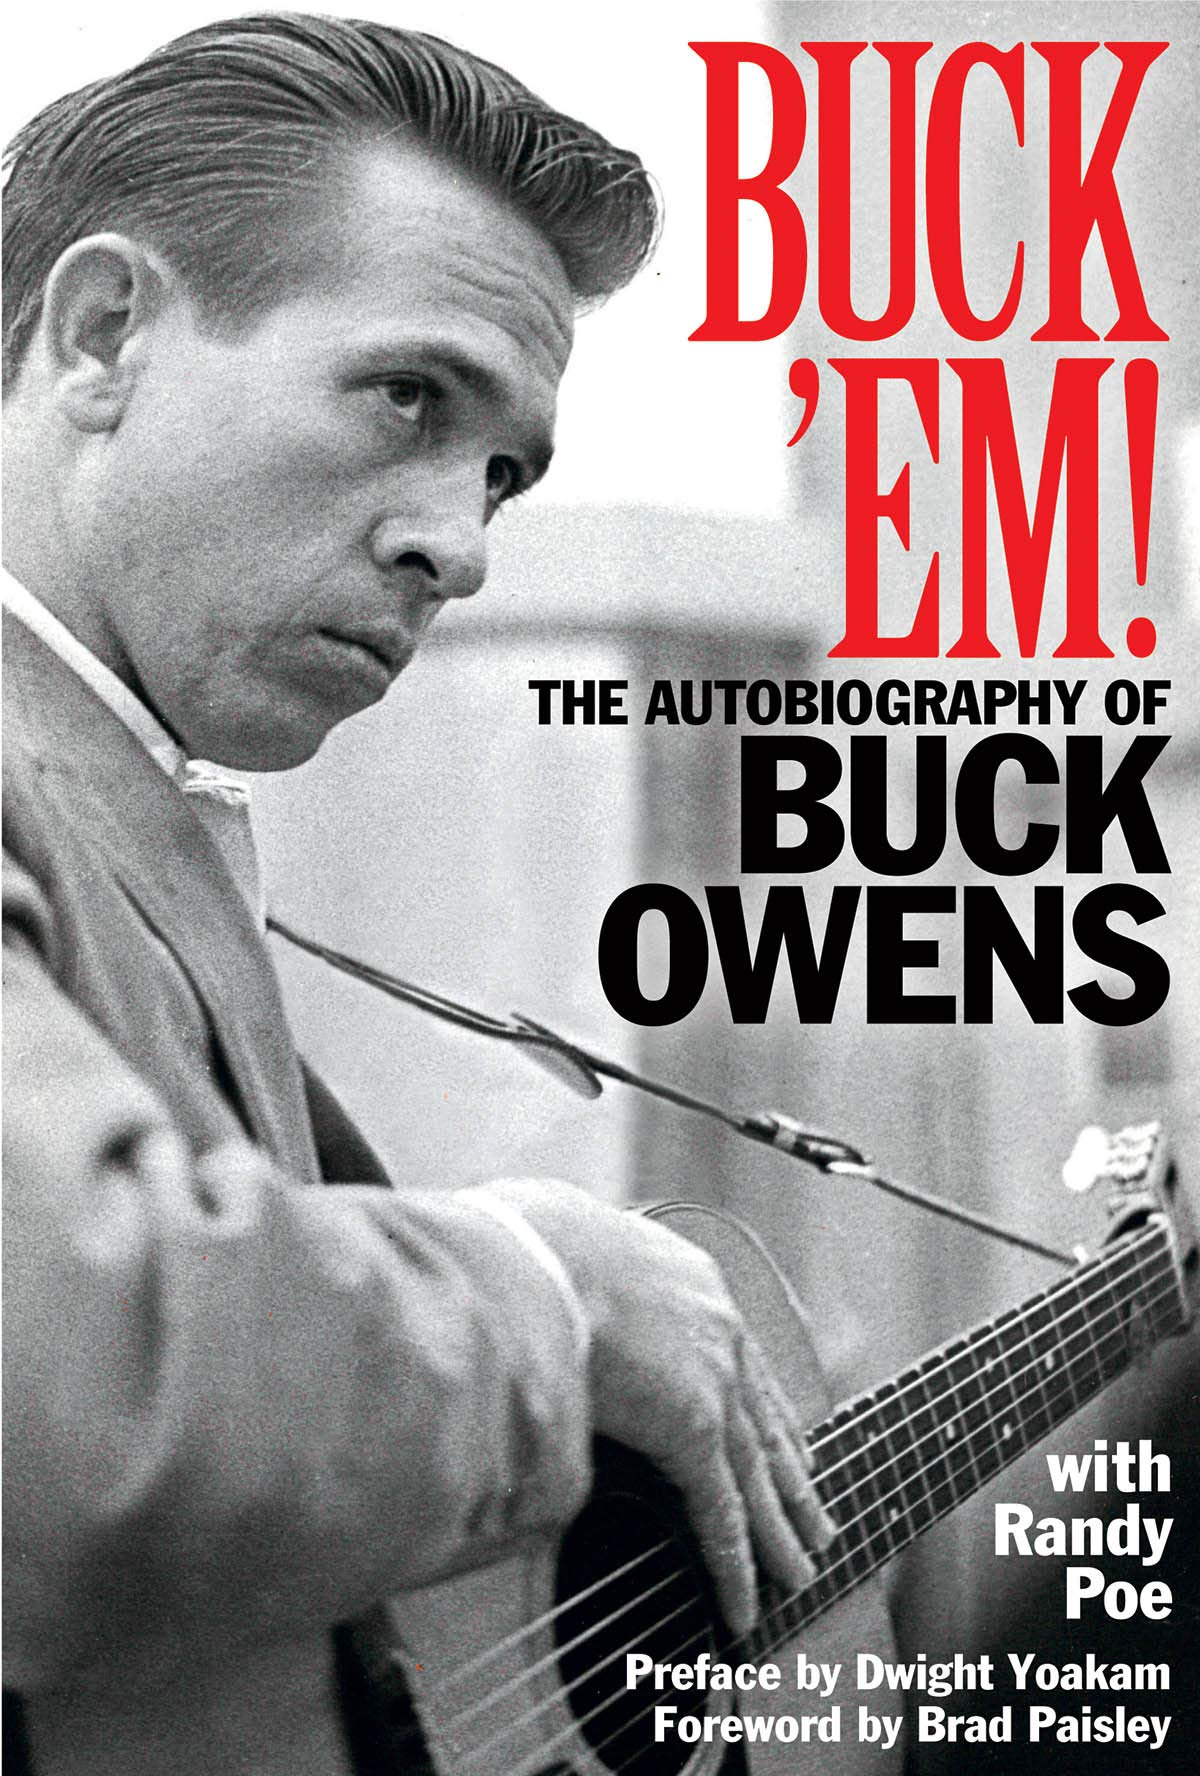 Buck 'Em: The Autobiography of Buck Owens: Amazon co uk: Randy Poe